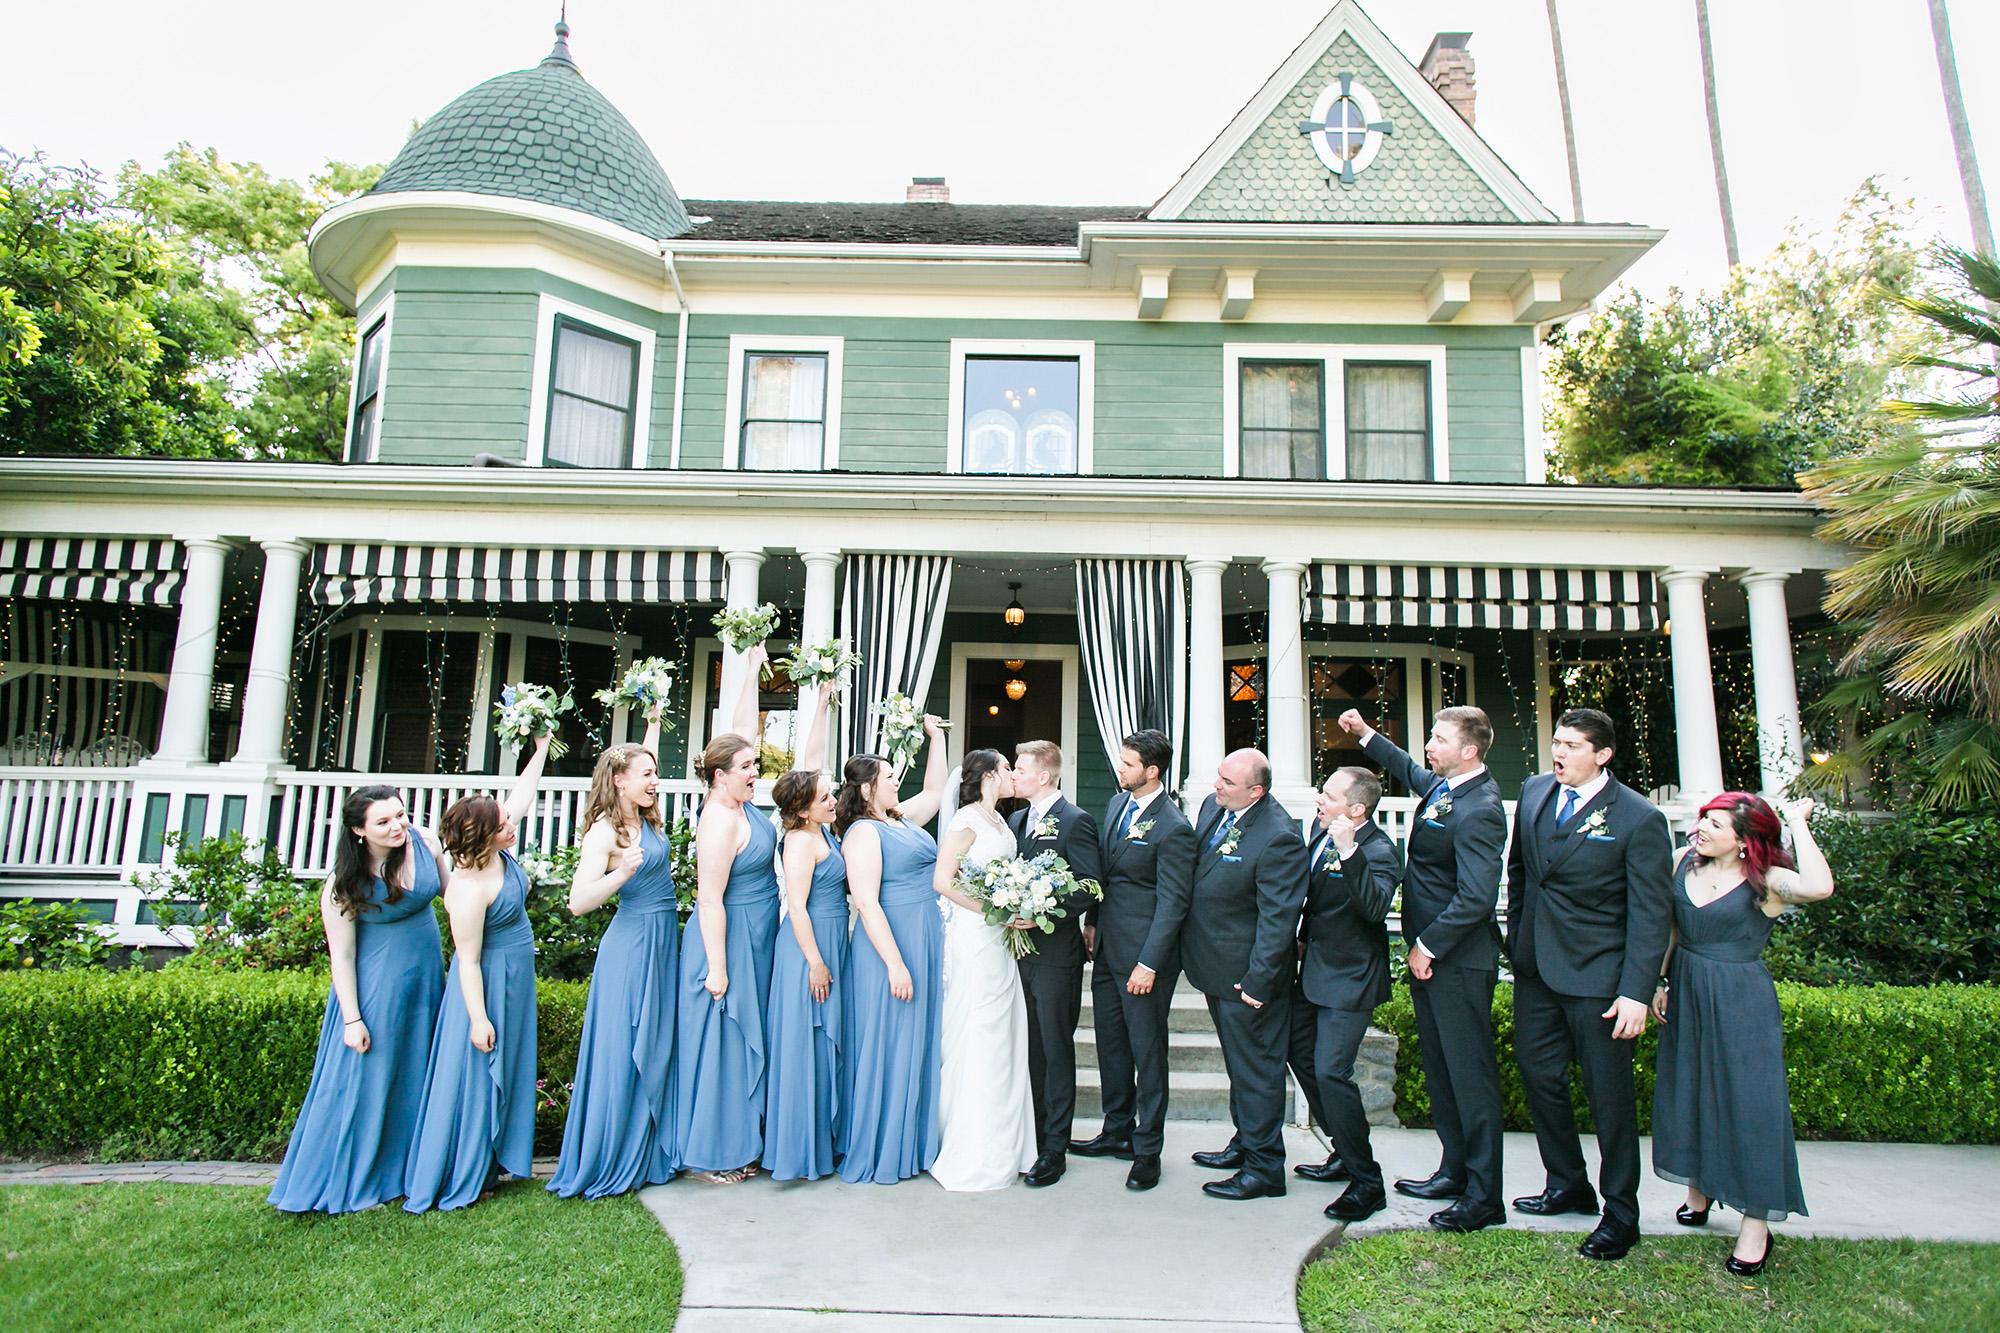 associate-photographer-christmas-house-wedding-carrie-vines-0130.jpg